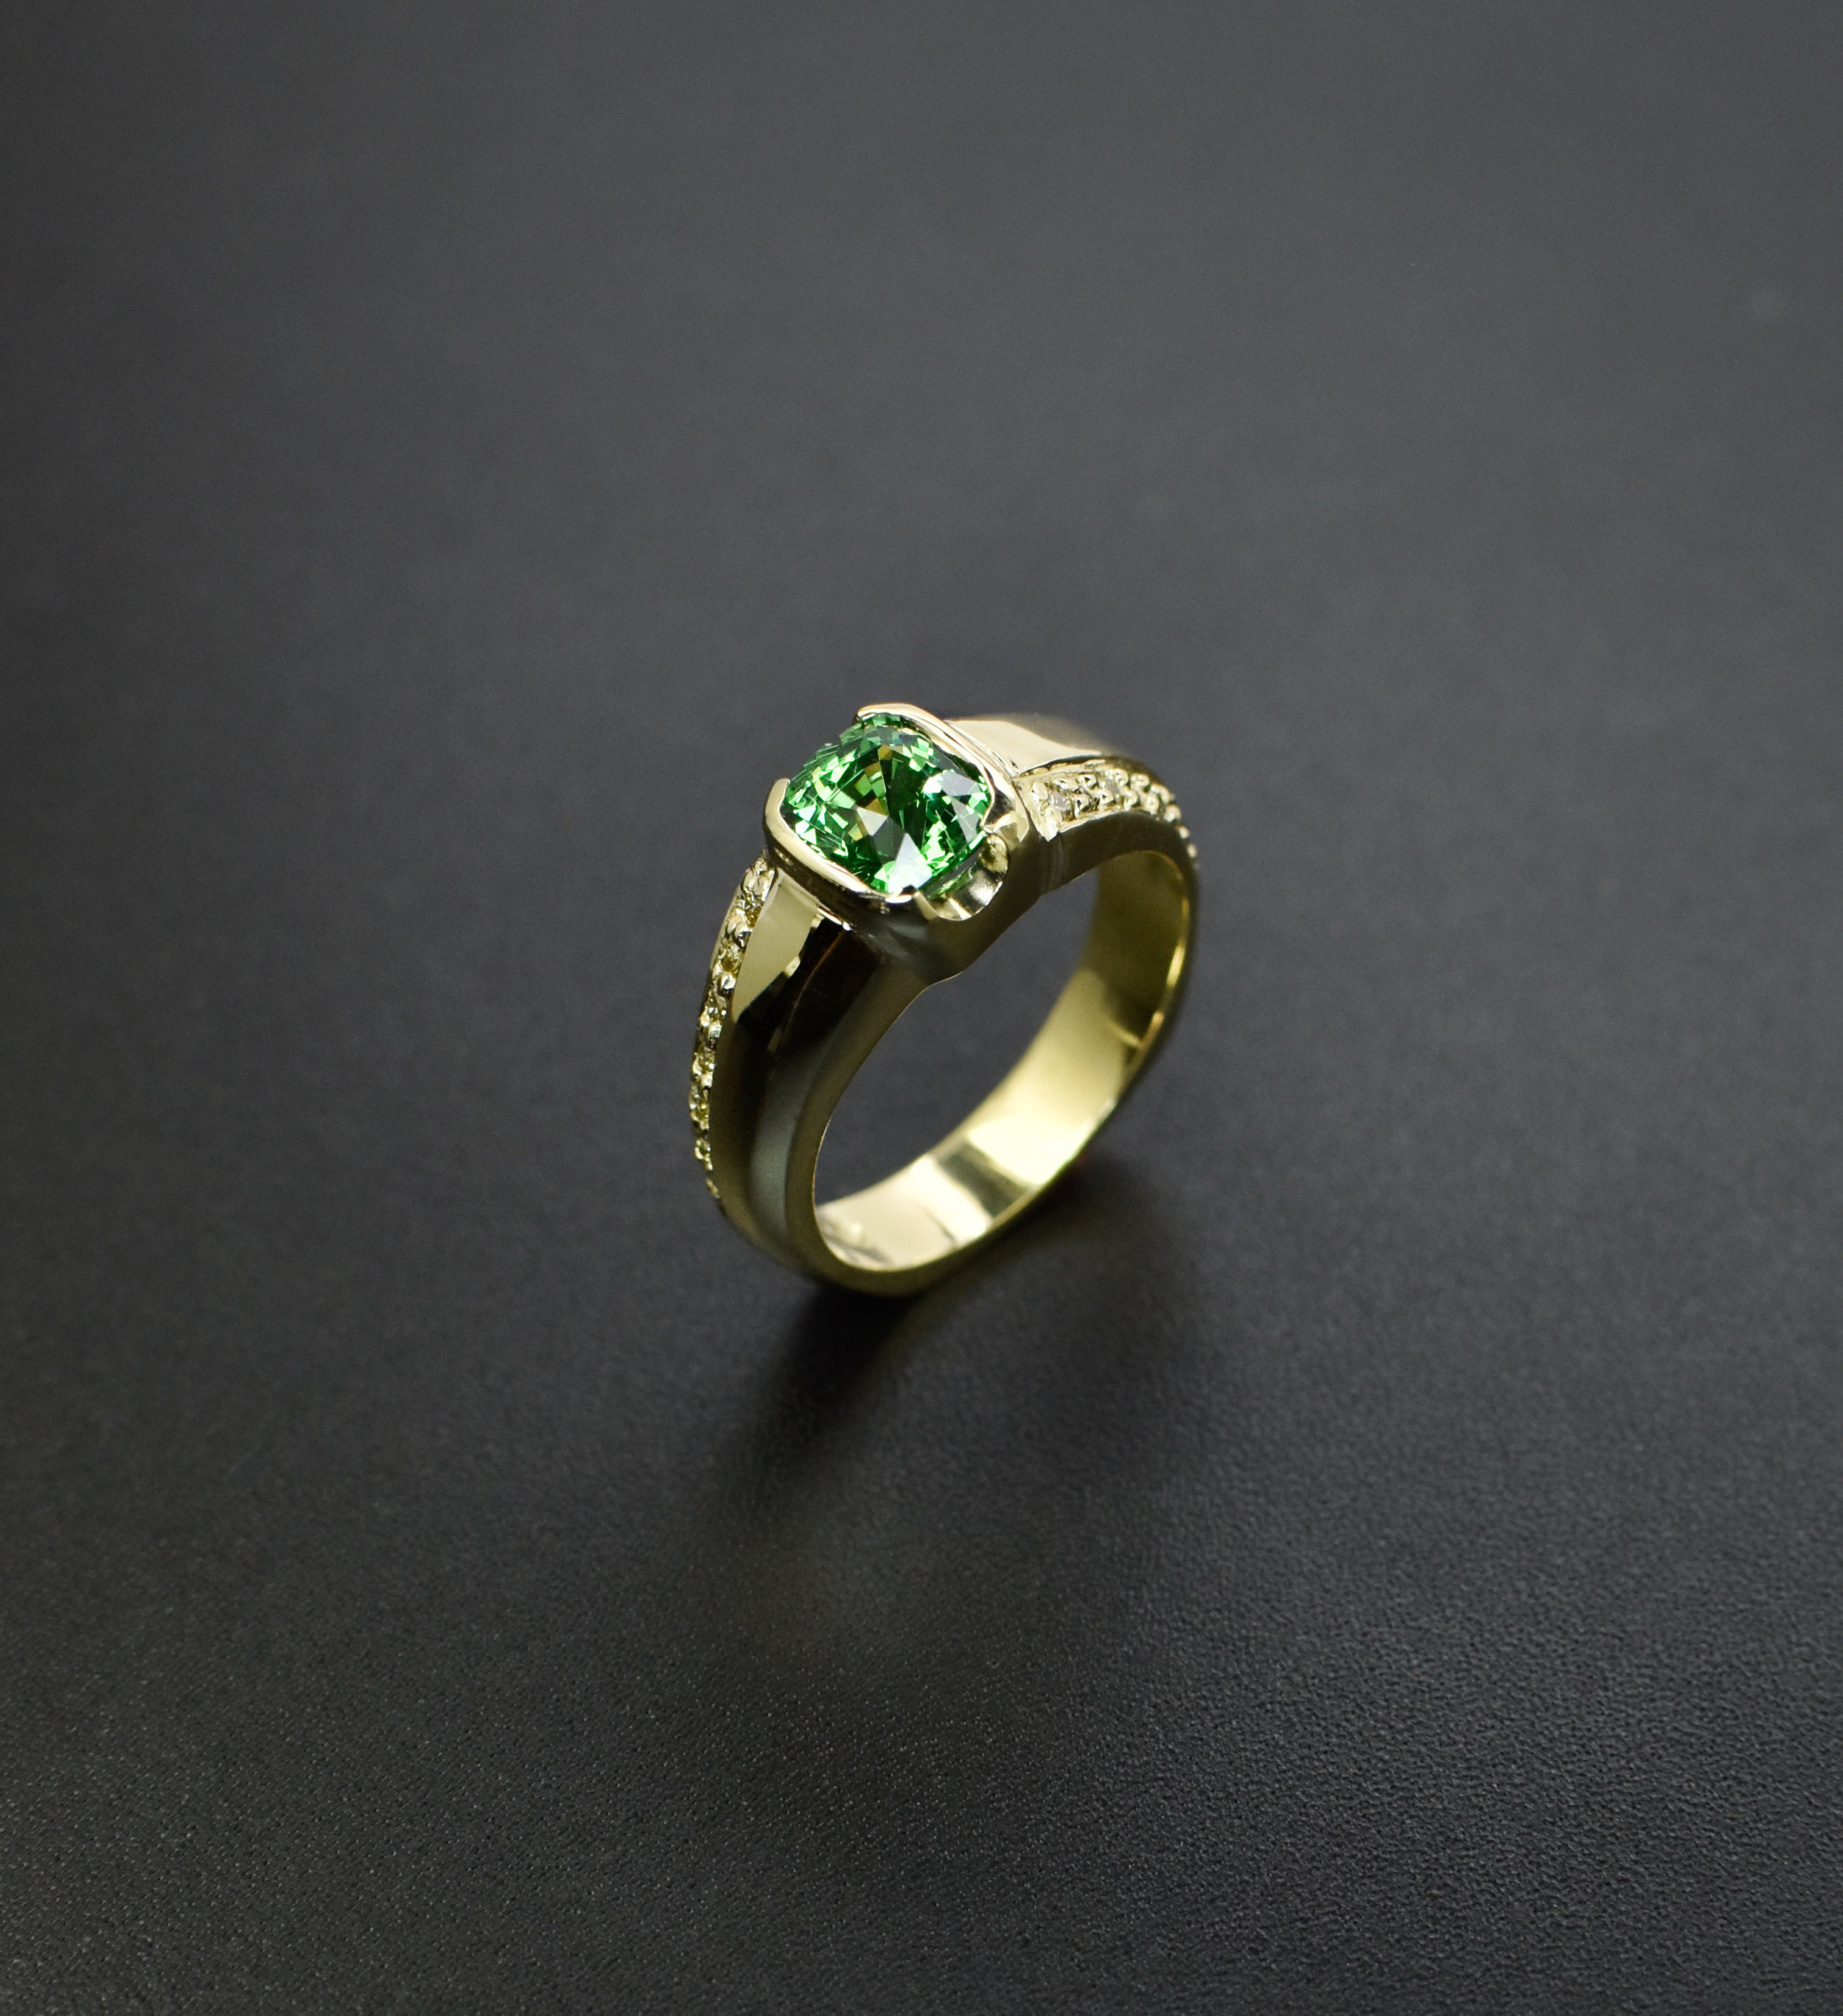 tsavorite_yellow_diamond_ring_2_dell_taylor.jpg